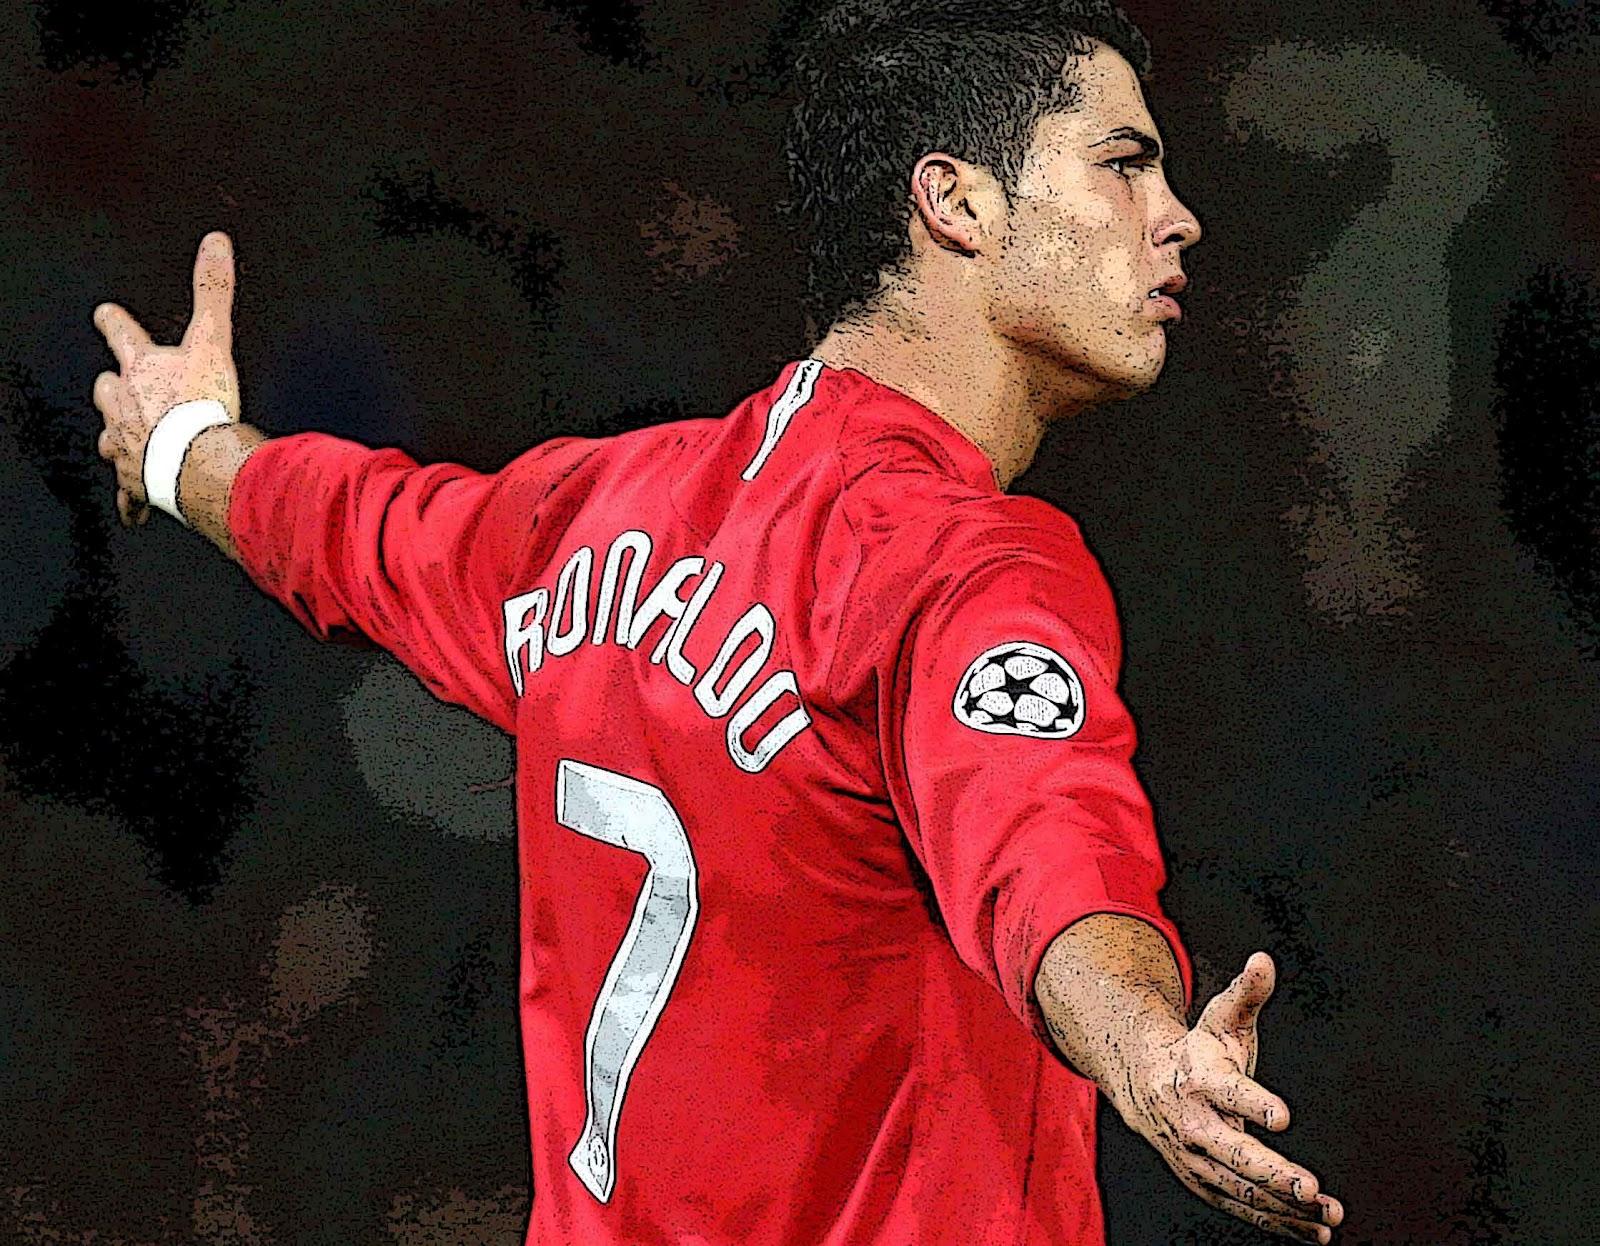 World Sports Hd Wallpapers: Cristiano Ronaldo Hd Wallpapers